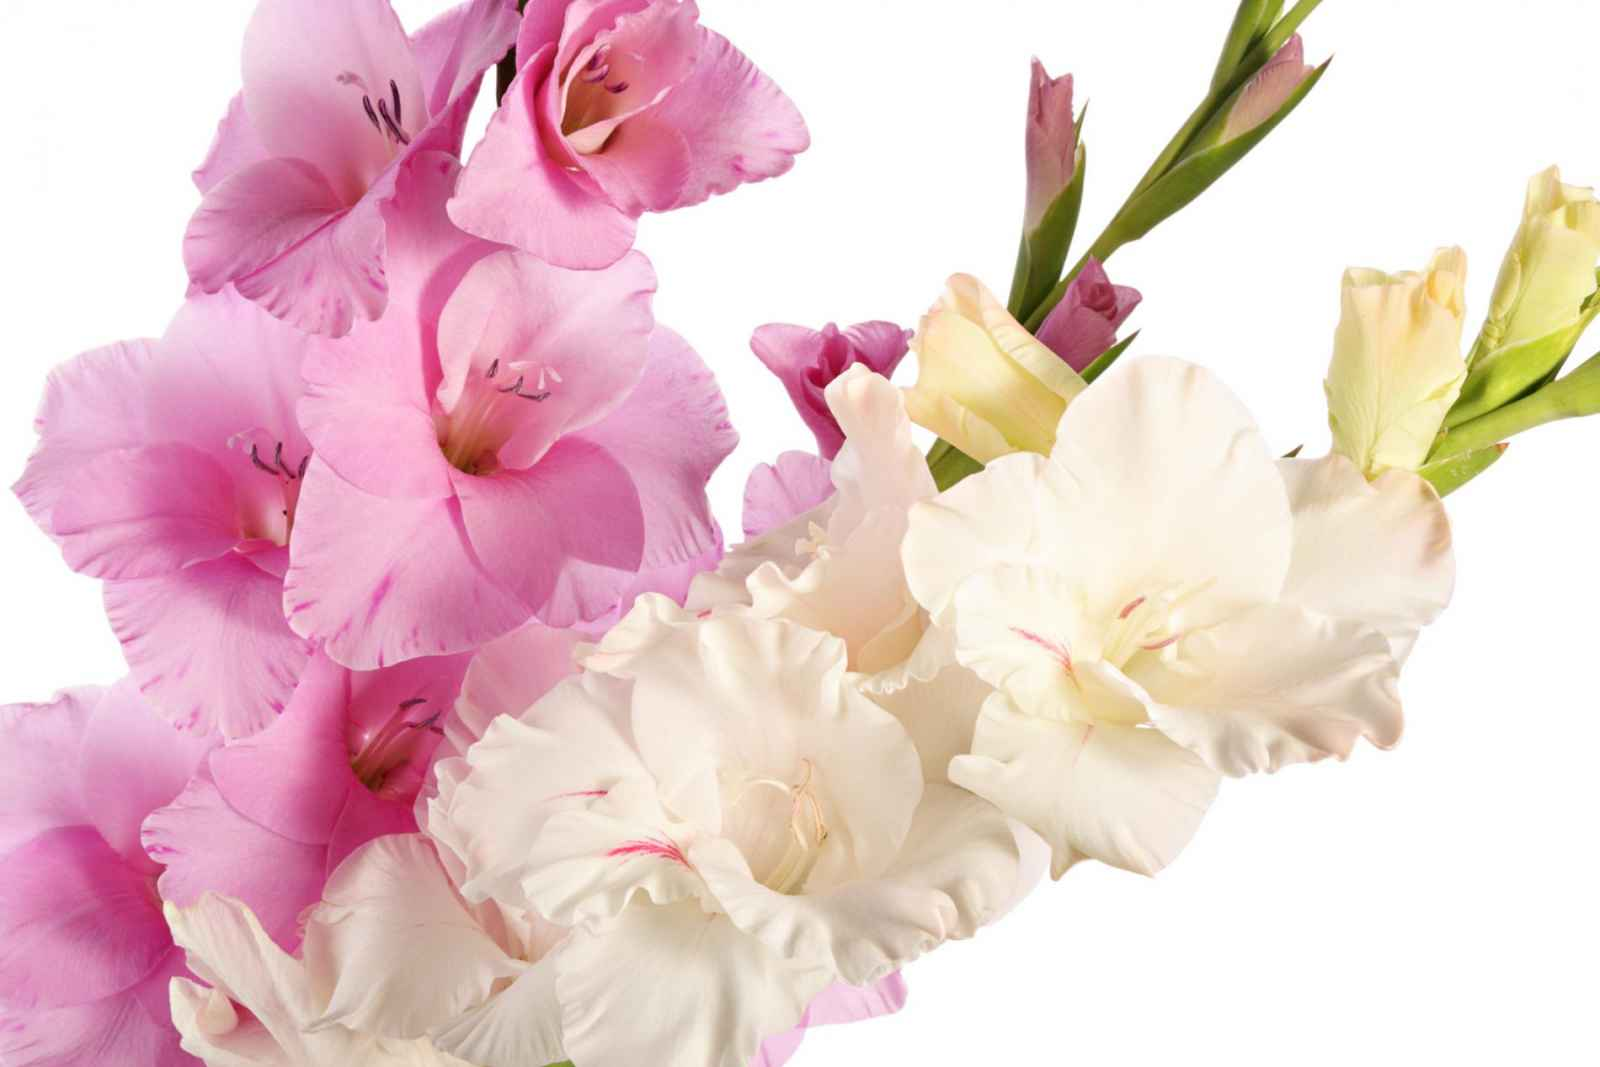 Affordable Wedding Flowers That Wont Break The Bank Weddingday